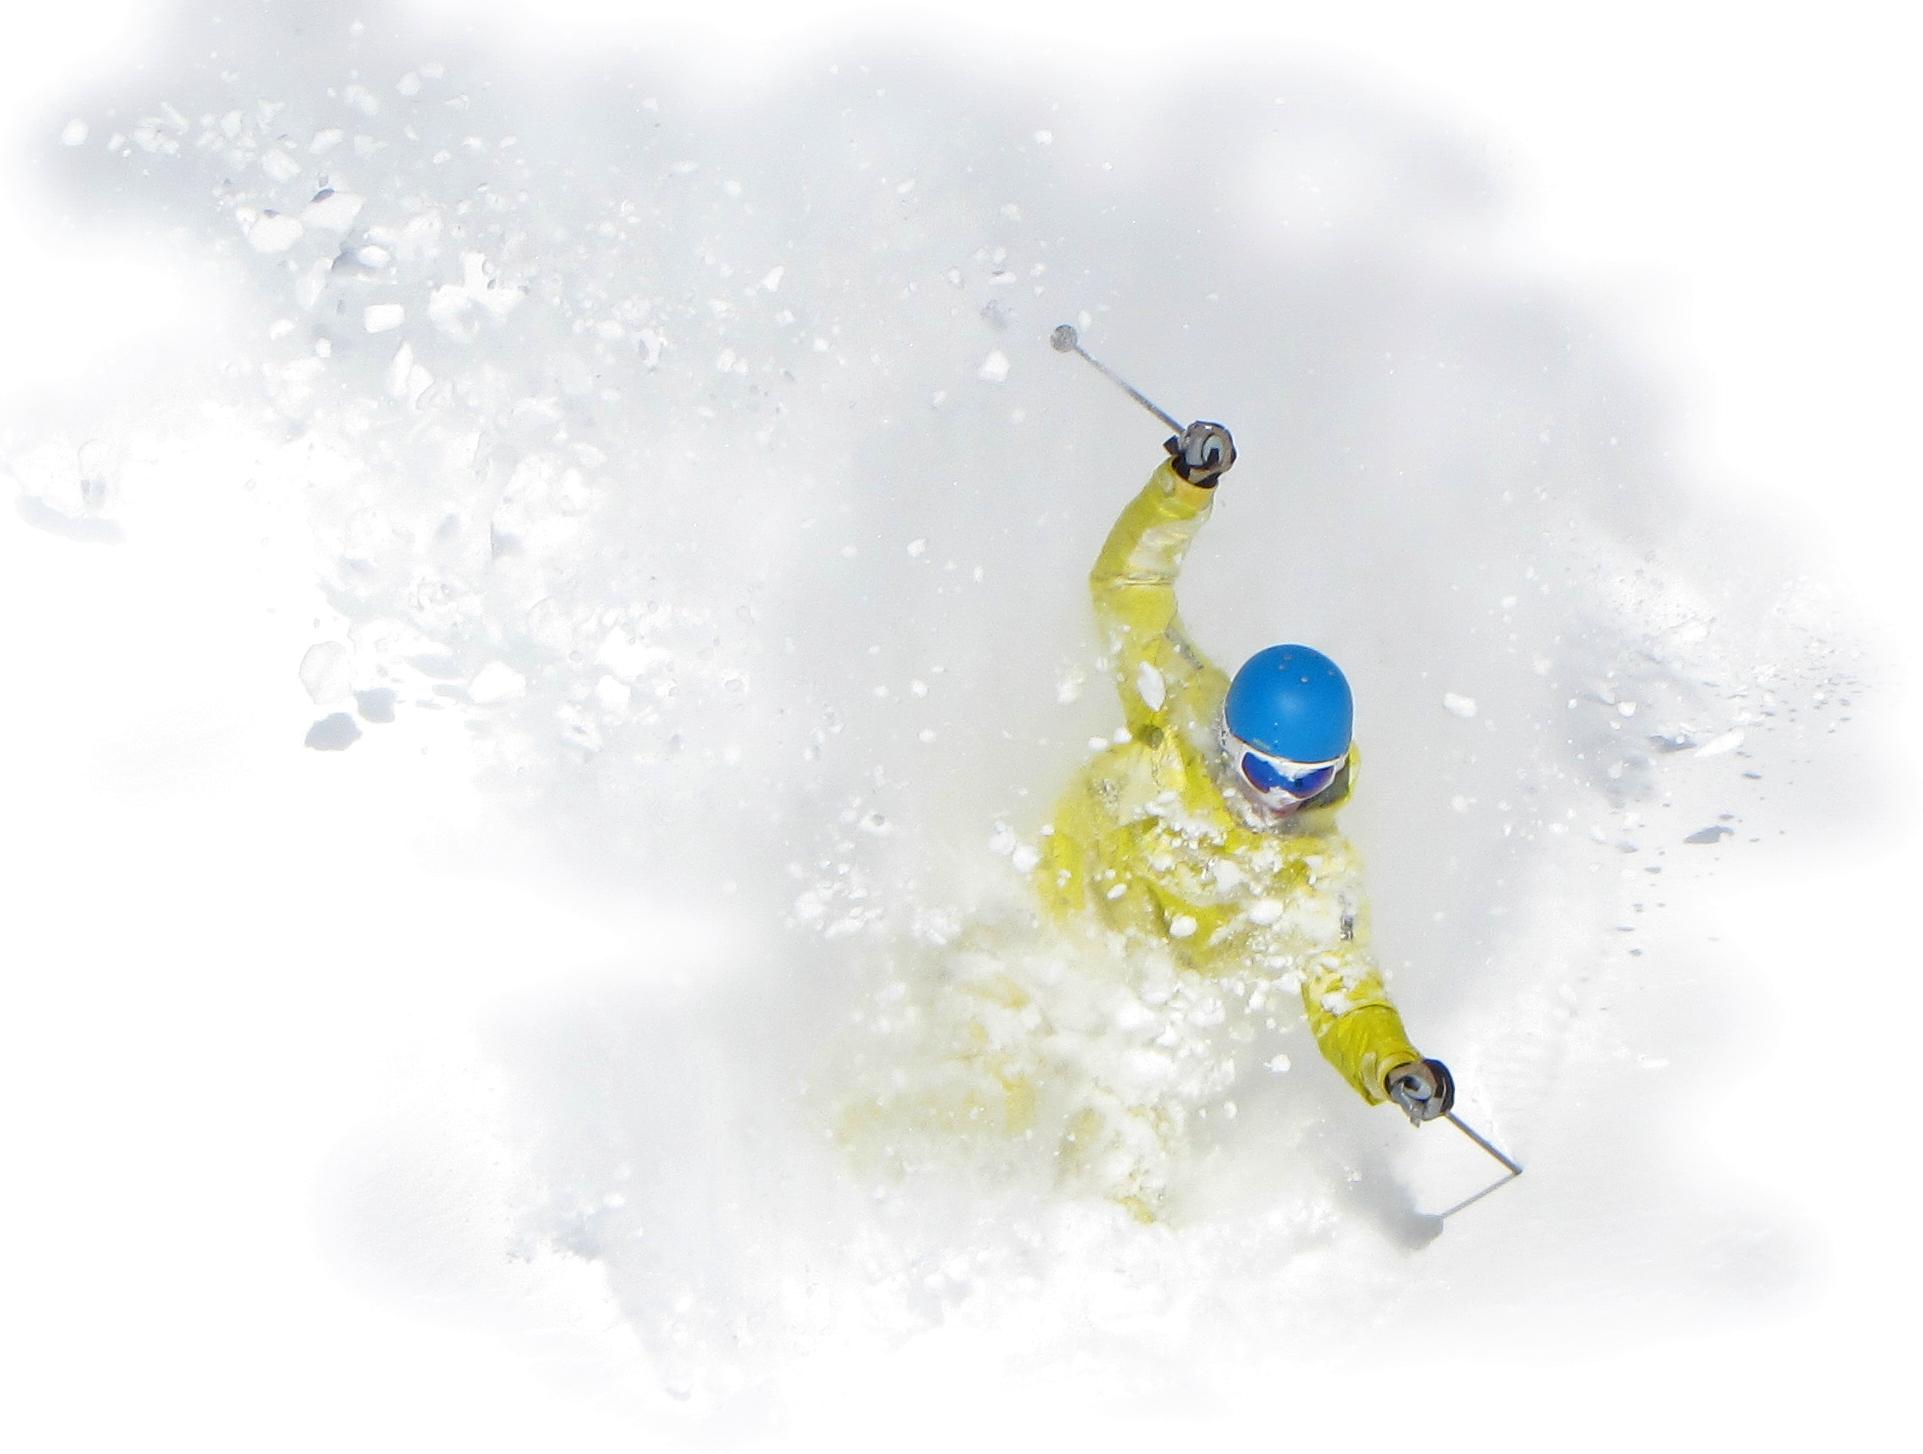 Skitechnikwochen am Arlberg - Restplätze